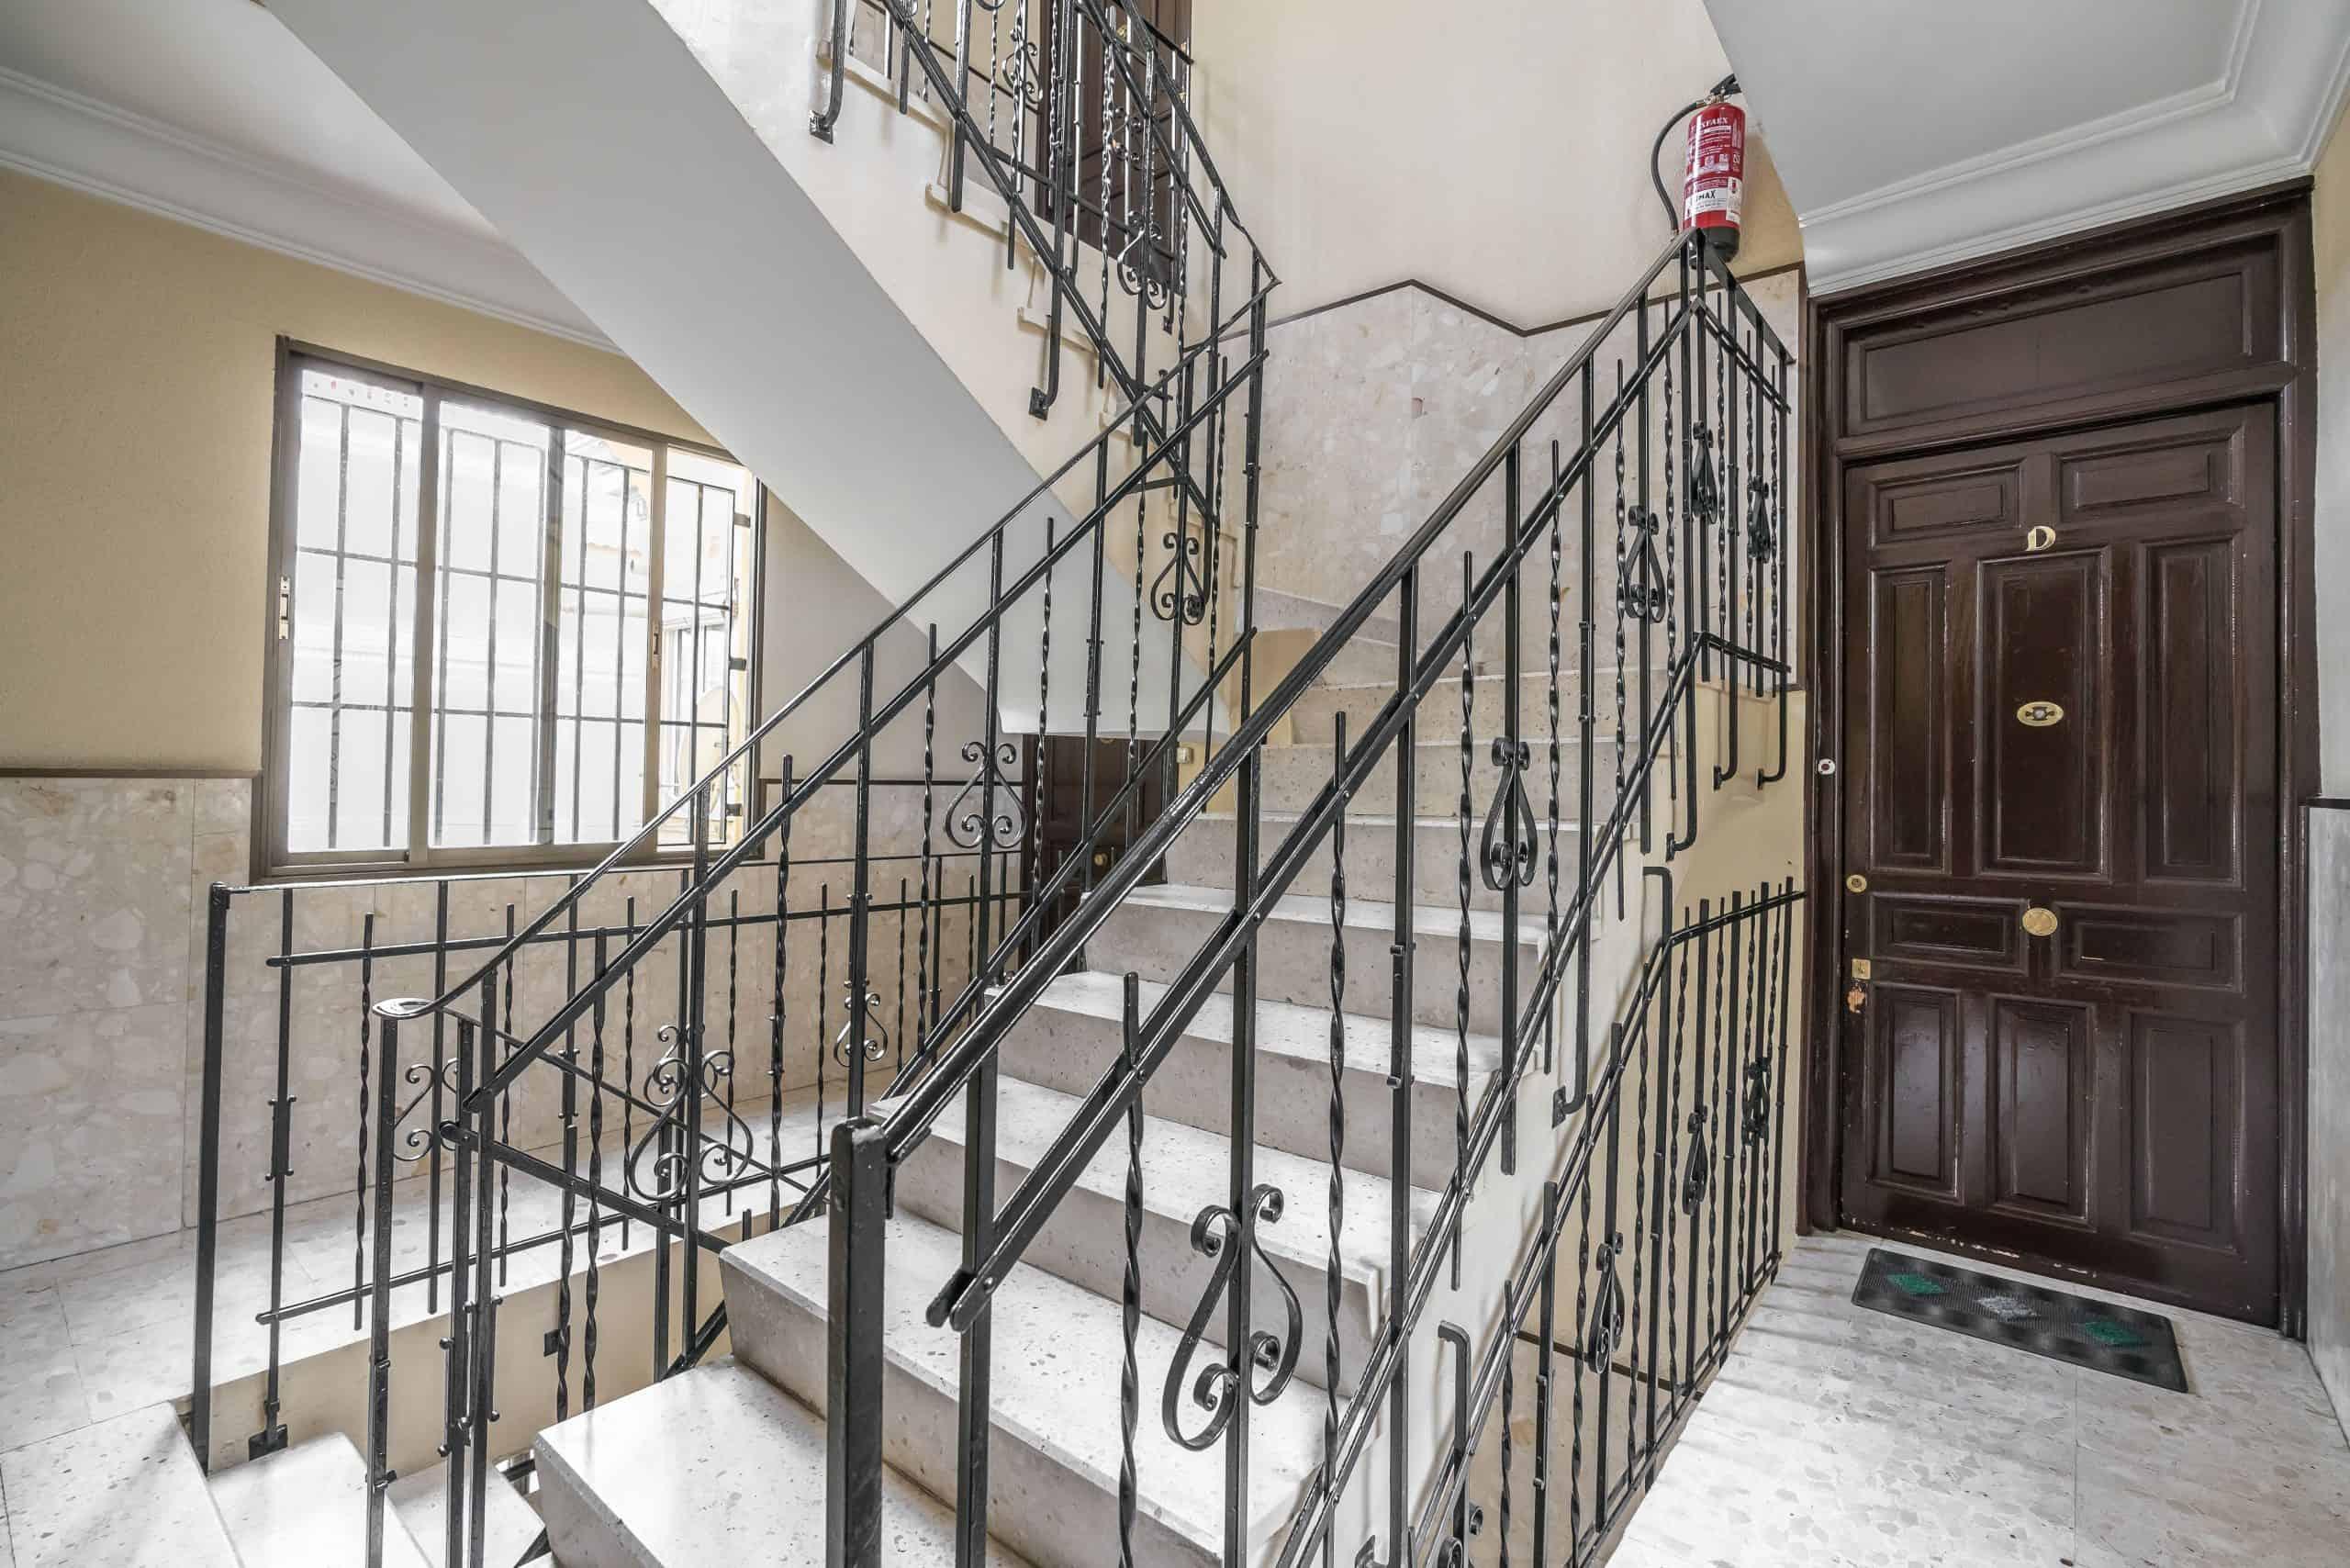 Agencia Inmobiliaria de Madrid-FUTUROCASA-Zona ARGANZUELA-EMBAJADORES-LEGAZPI8 ZONAS COMUNES (1)